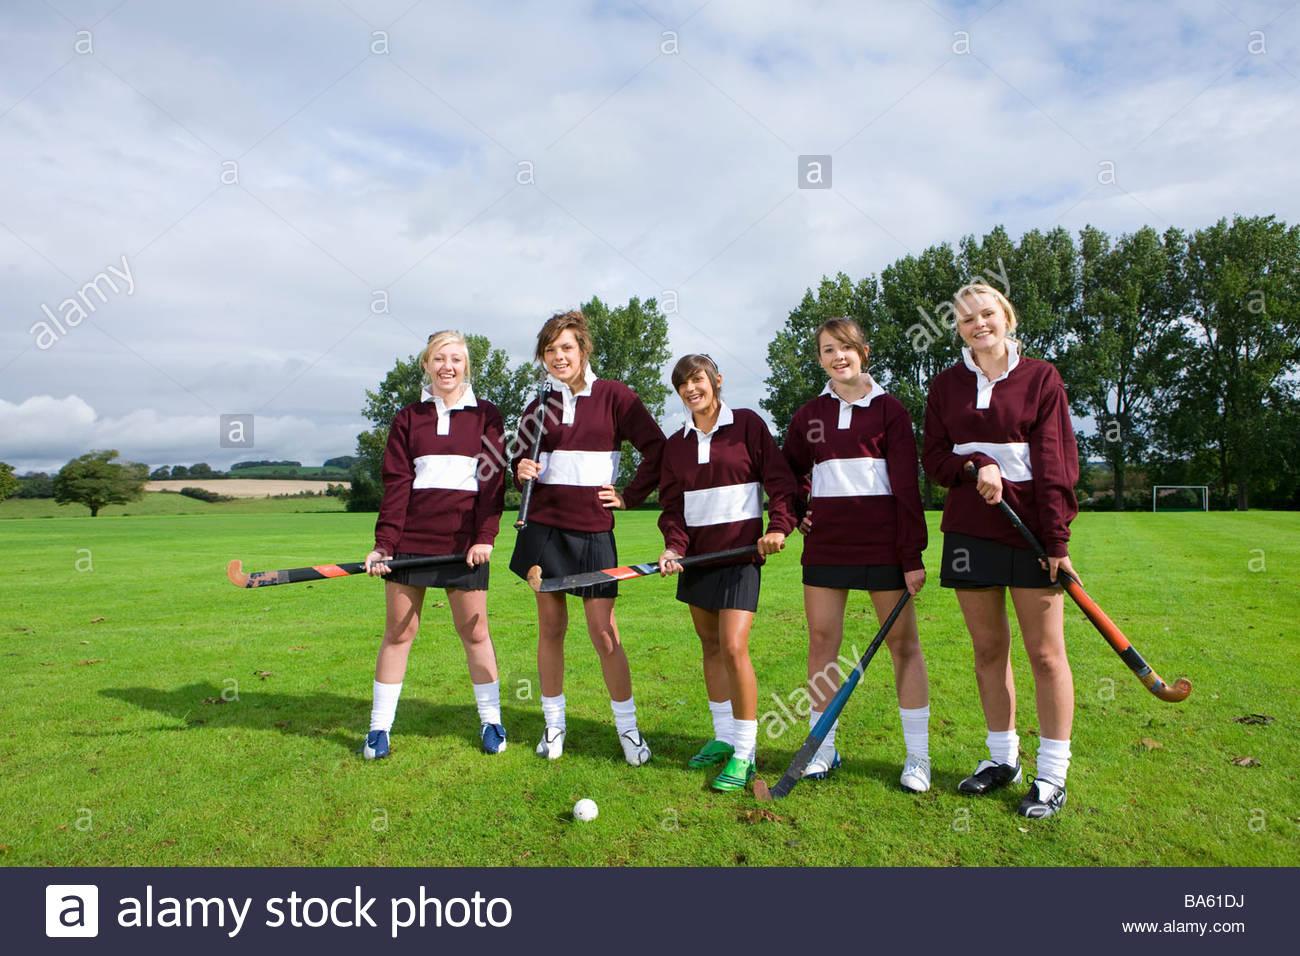 Teenage girl field hockey team - Stock Image